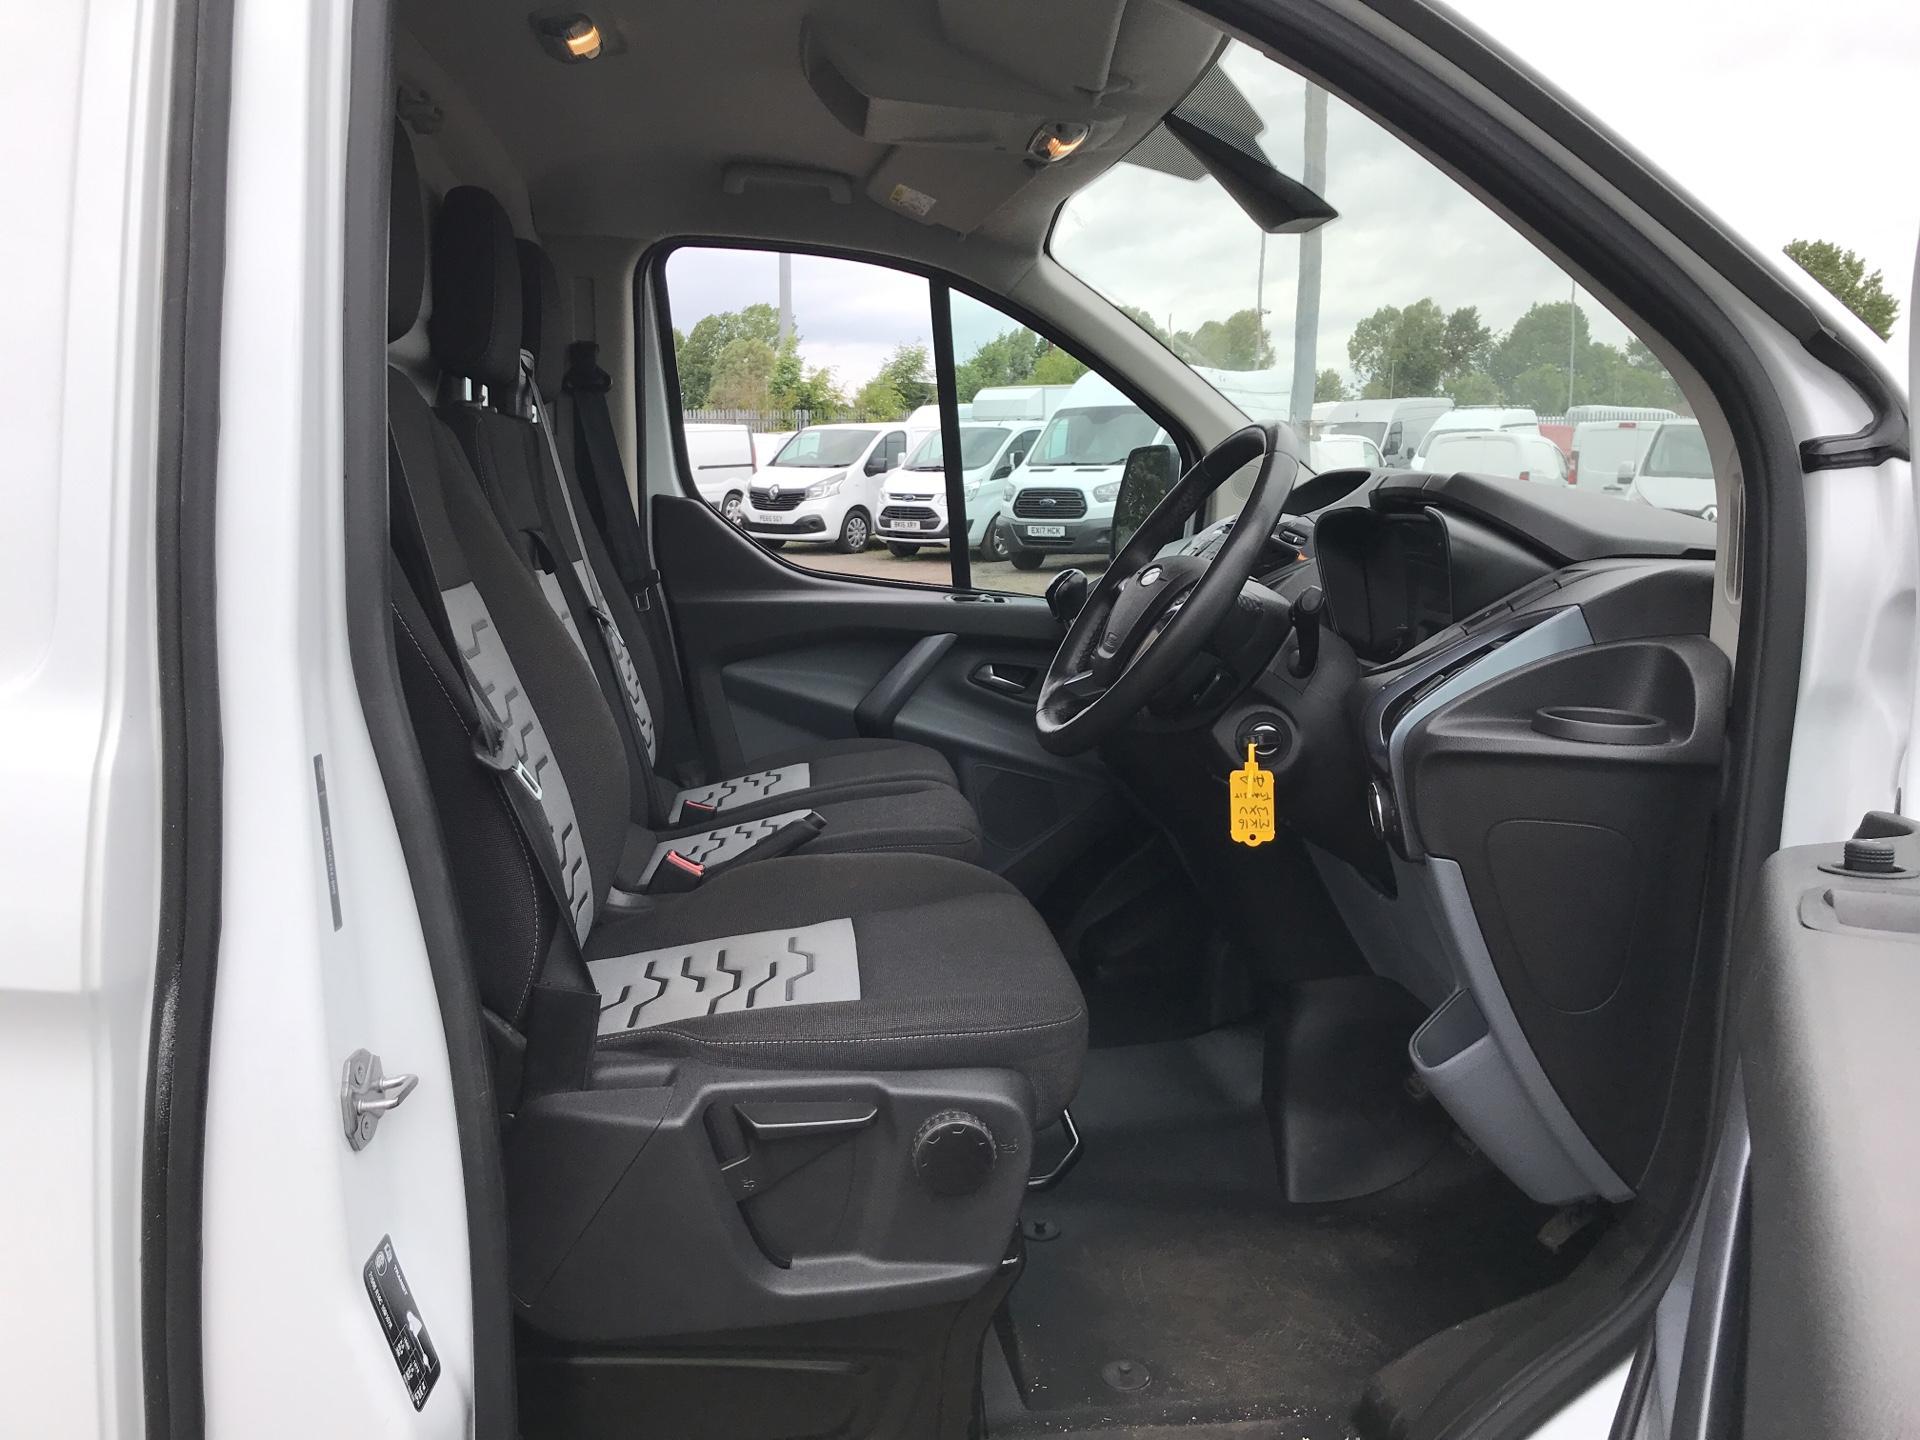 2016 Ford Transit Custom 290 L1 DIESEL FWD 2.2 TDCI 125 PS LOW ROOF LIMITED VAN EURO 5 (MK16WXV) Image 9